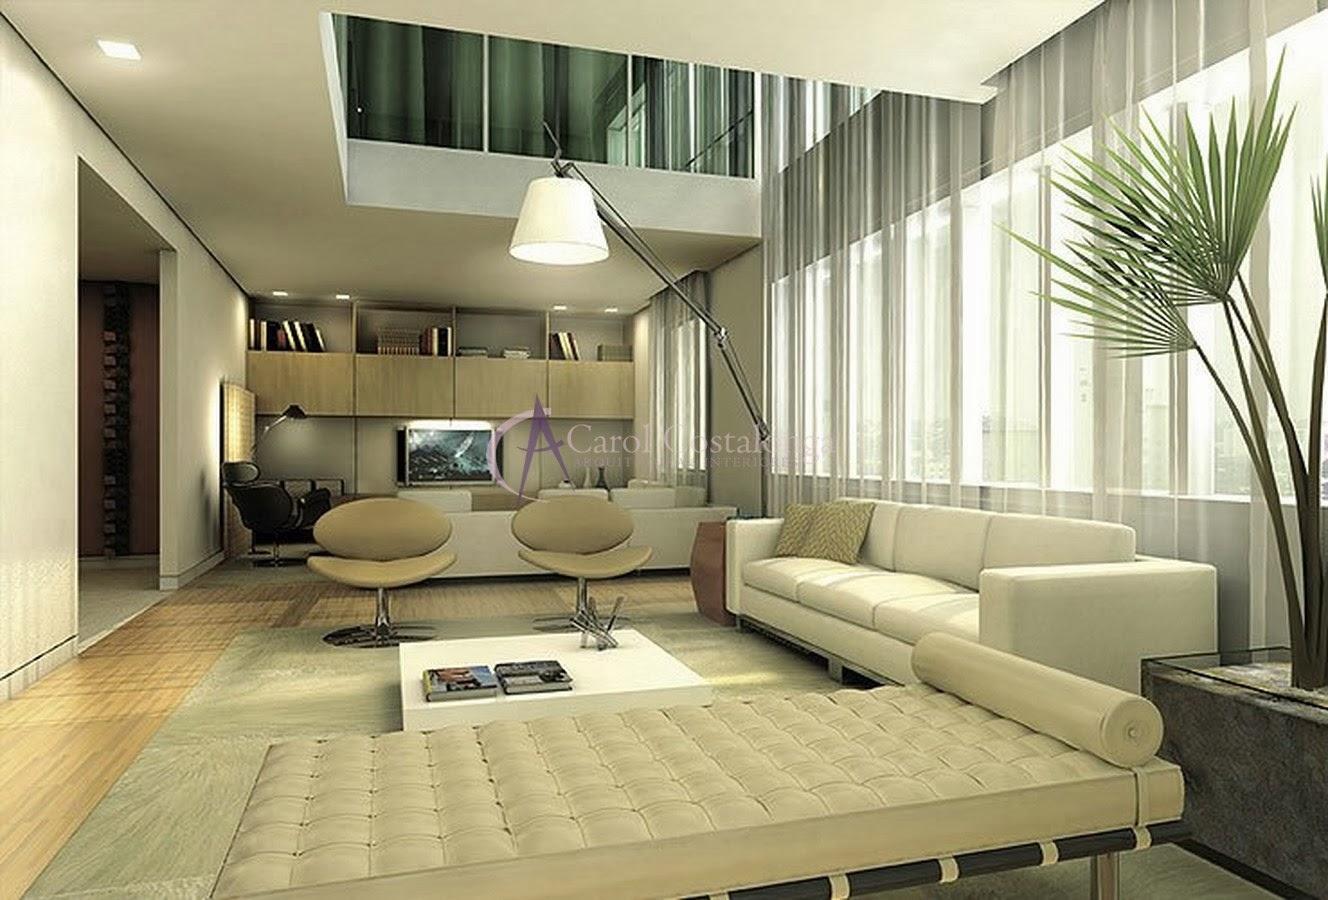 Construindo Minha Casa Clean~ Decoracao De Interiores De Sobrados